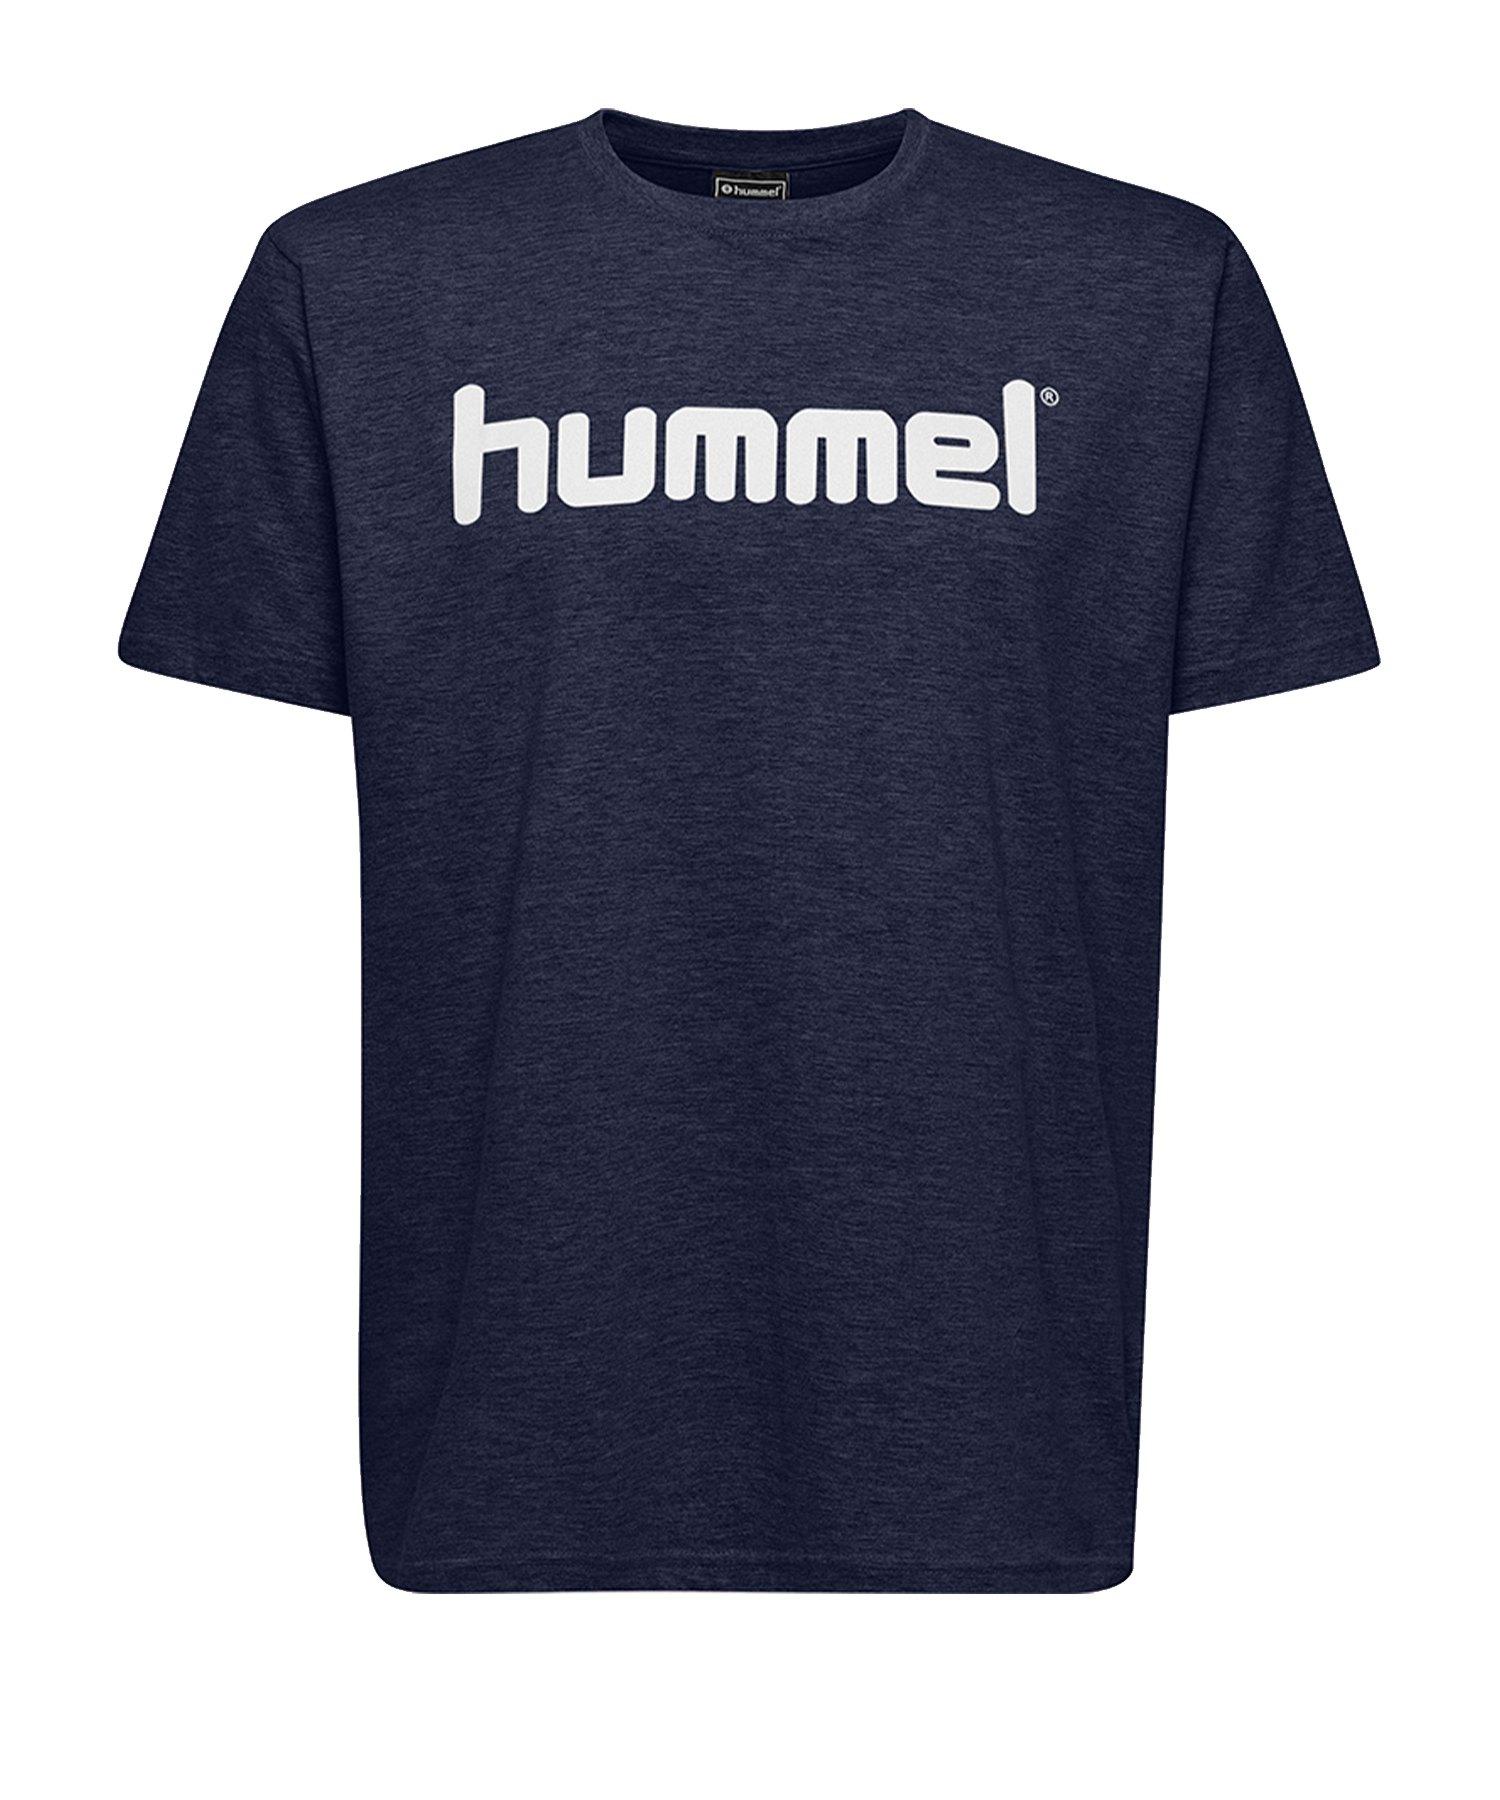 Hummel Cotton T-Shirt Logo Blau F7026 - Blau